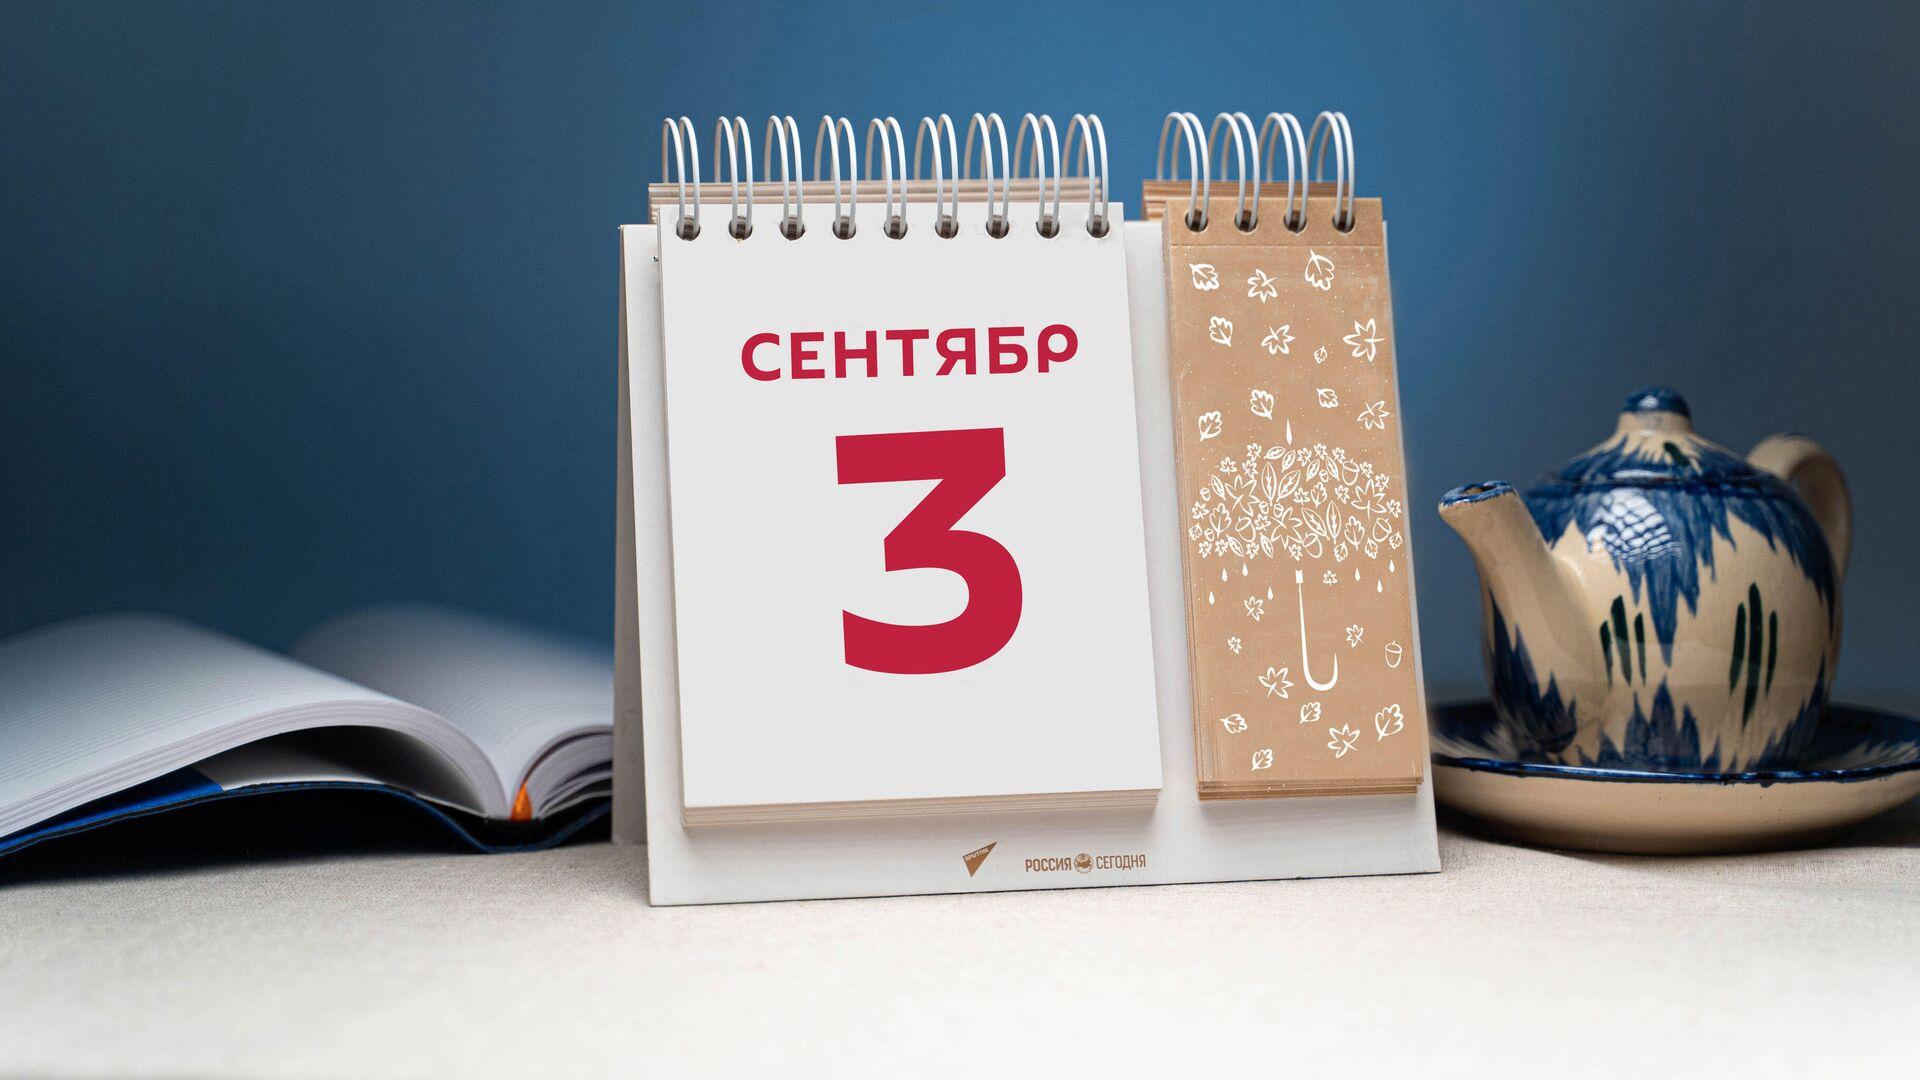 День 3 сентября - Sputnik Тоҷикистон, 1920, 03.09.2021